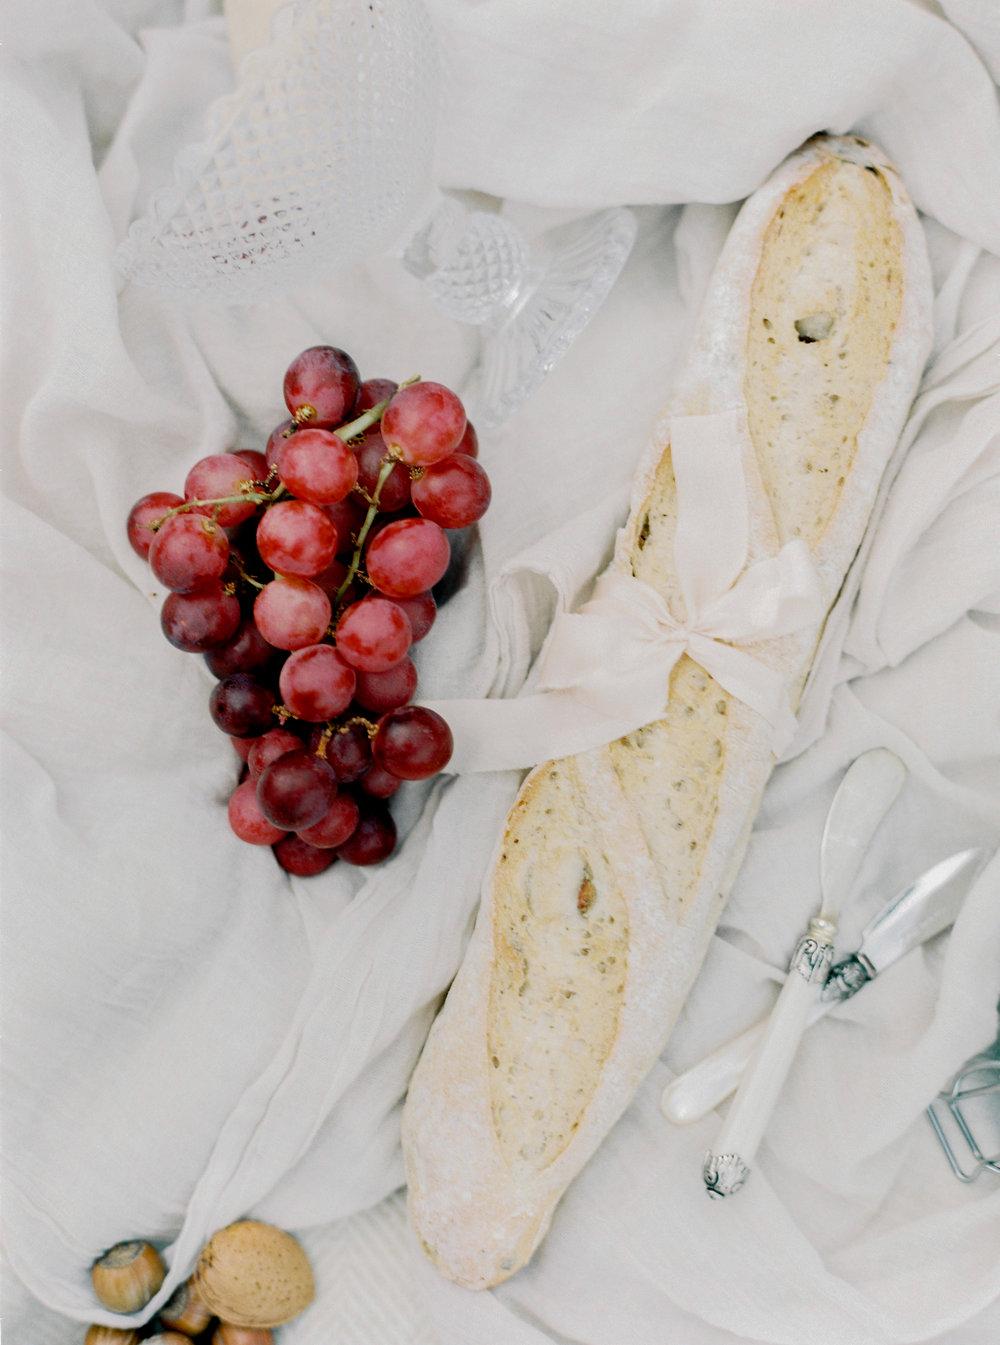 Luxury Wedding Planner UK | Our Chic & Romantic Engagement Shoot in Bath | Katie Julia Photography - 59.JPG